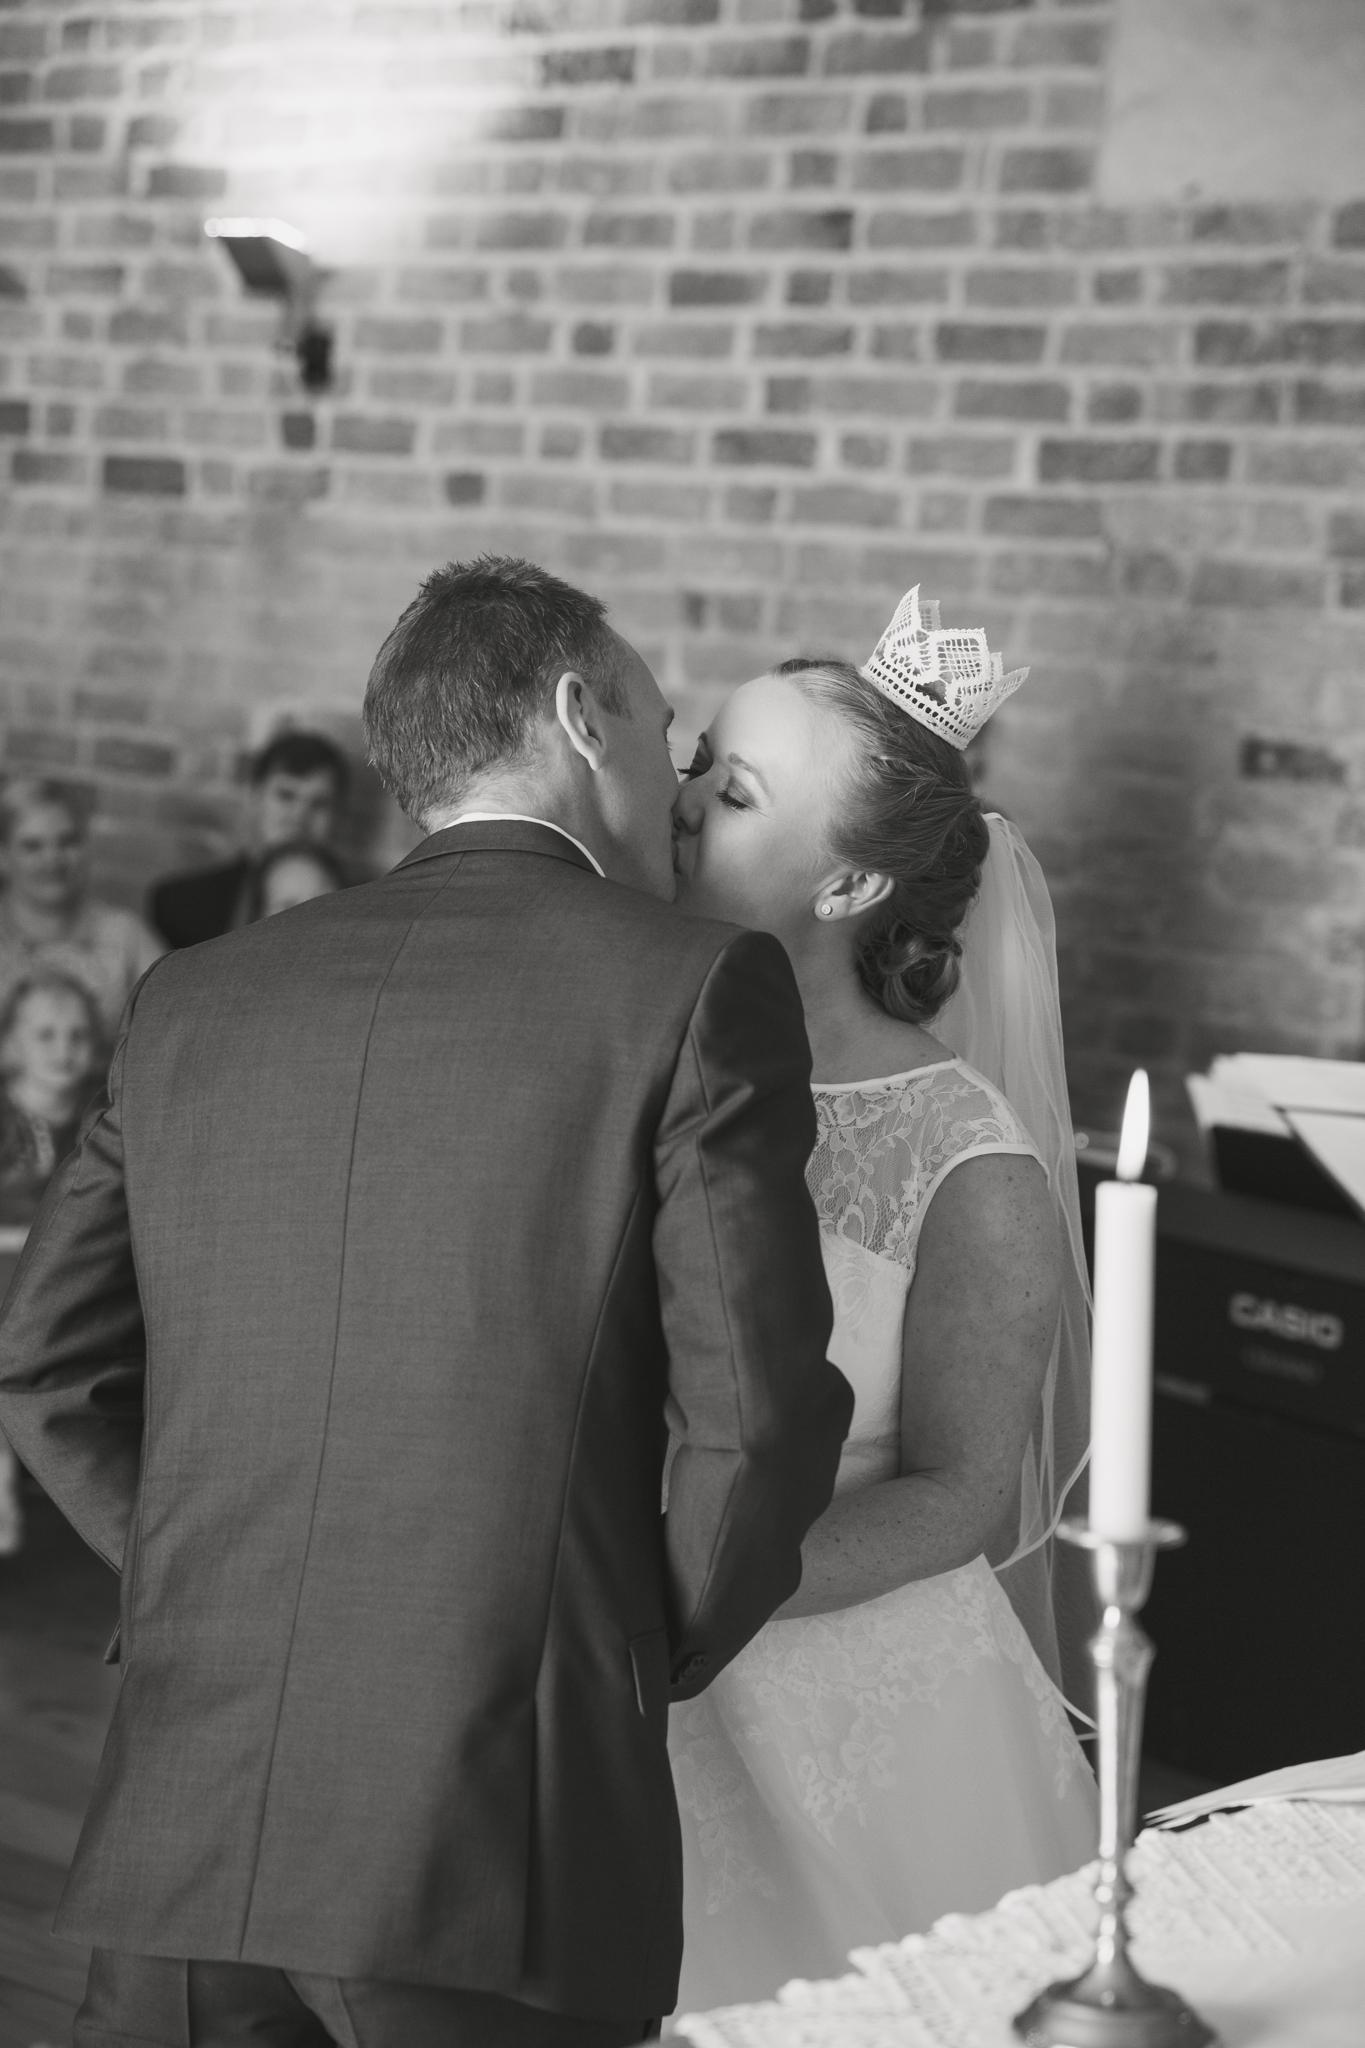 ViOli Photography bröllopsfotograf-Karlshamn-Blekinge-Ronneby-Karlskrona-Sölvesborg-Bromölla-Kristianstad (23 av 35)